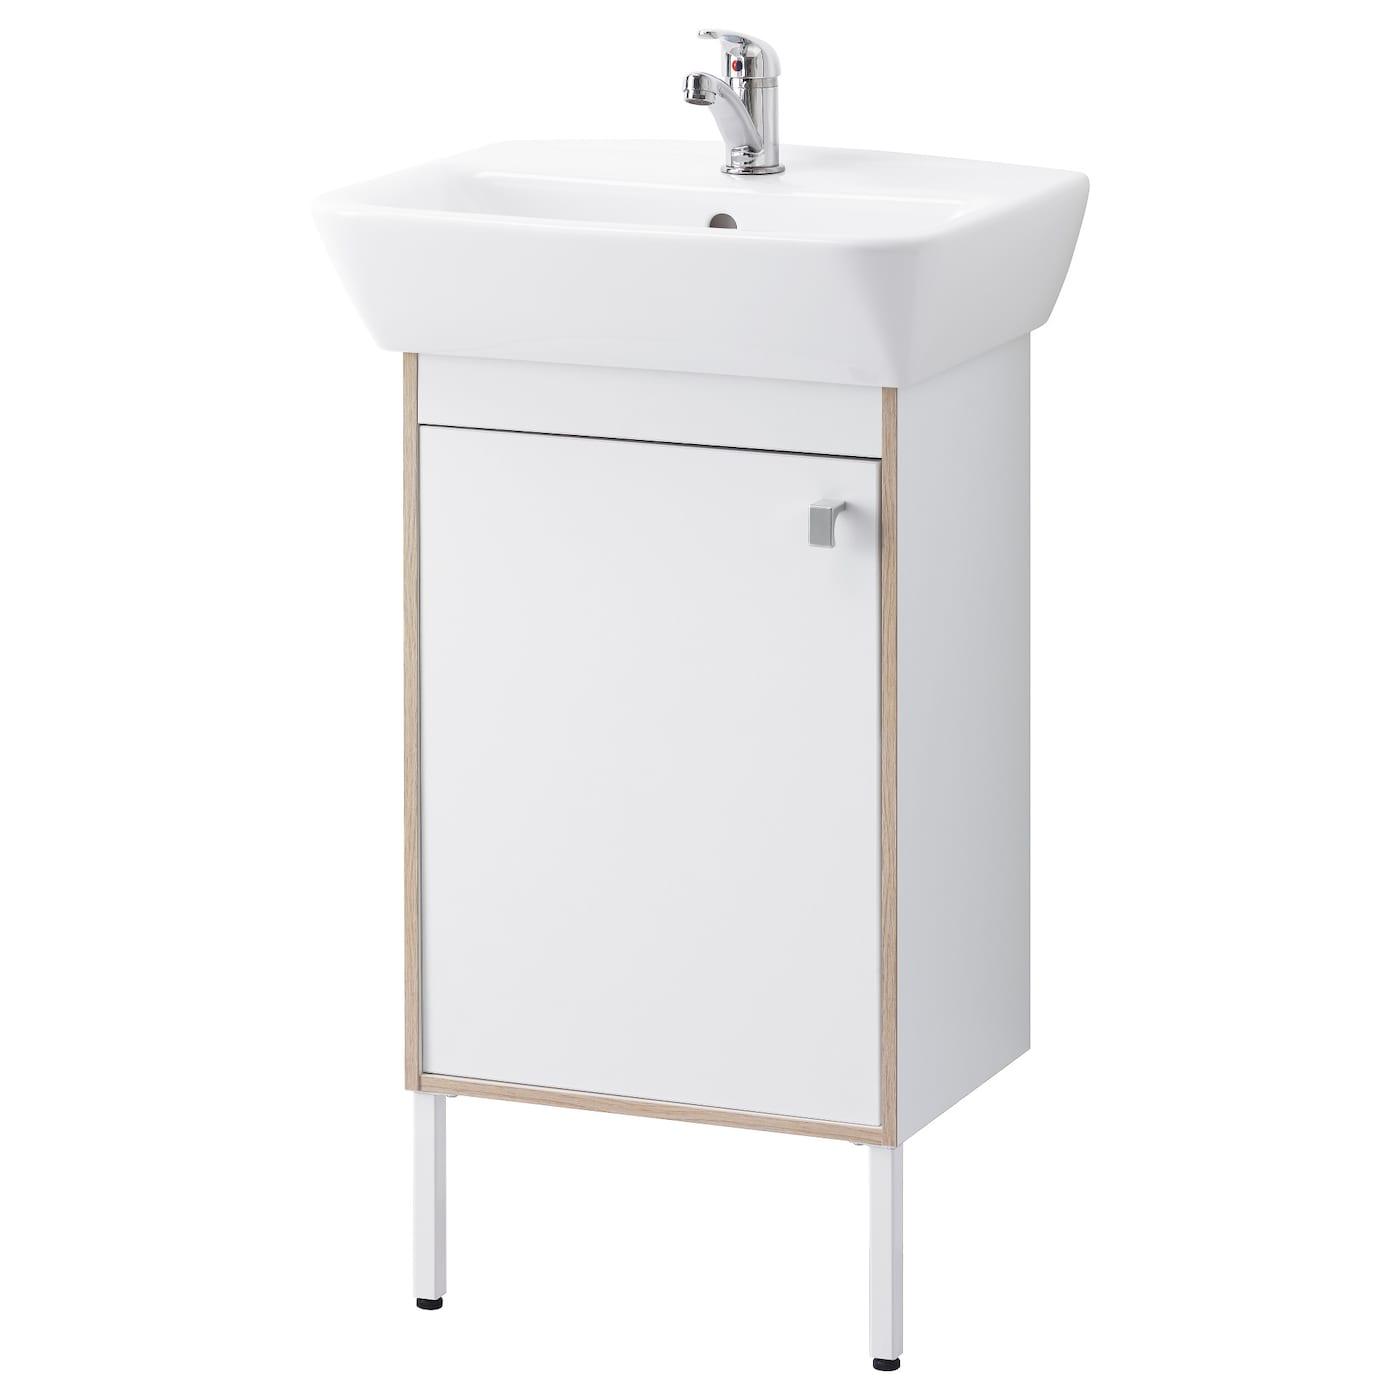 tyngen washbasin cabinet with 1 door white 51x40x88 cm ikea. Black Bedroom Furniture Sets. Home Design Ideas